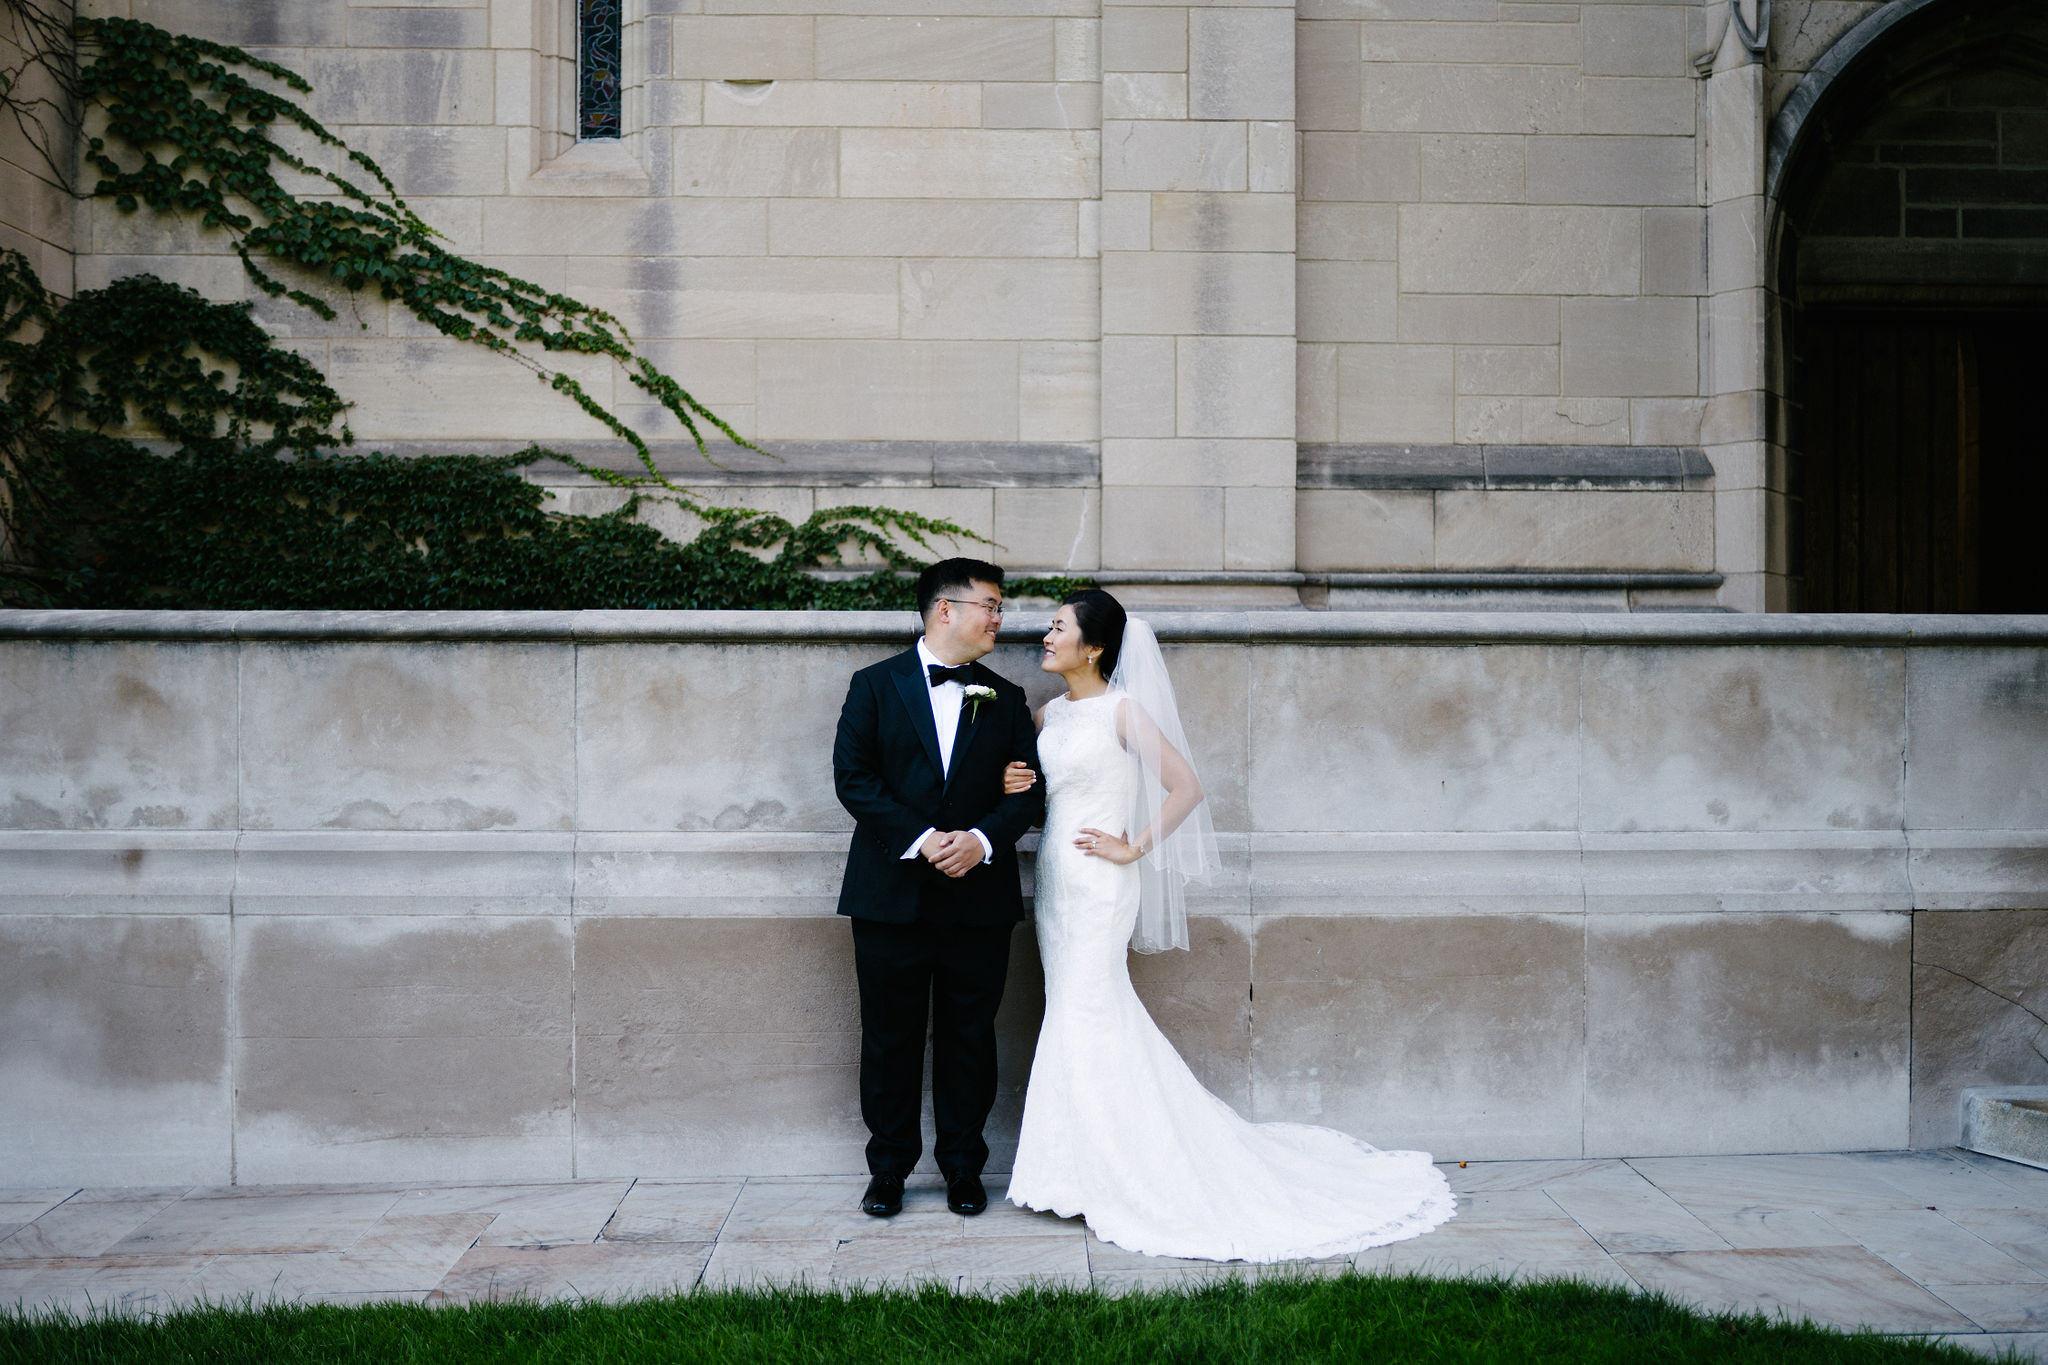 019-rempel-photography-chicago-wedding-inspiration-sara-philip-rockefeller-chapel-trump-tower.jpg